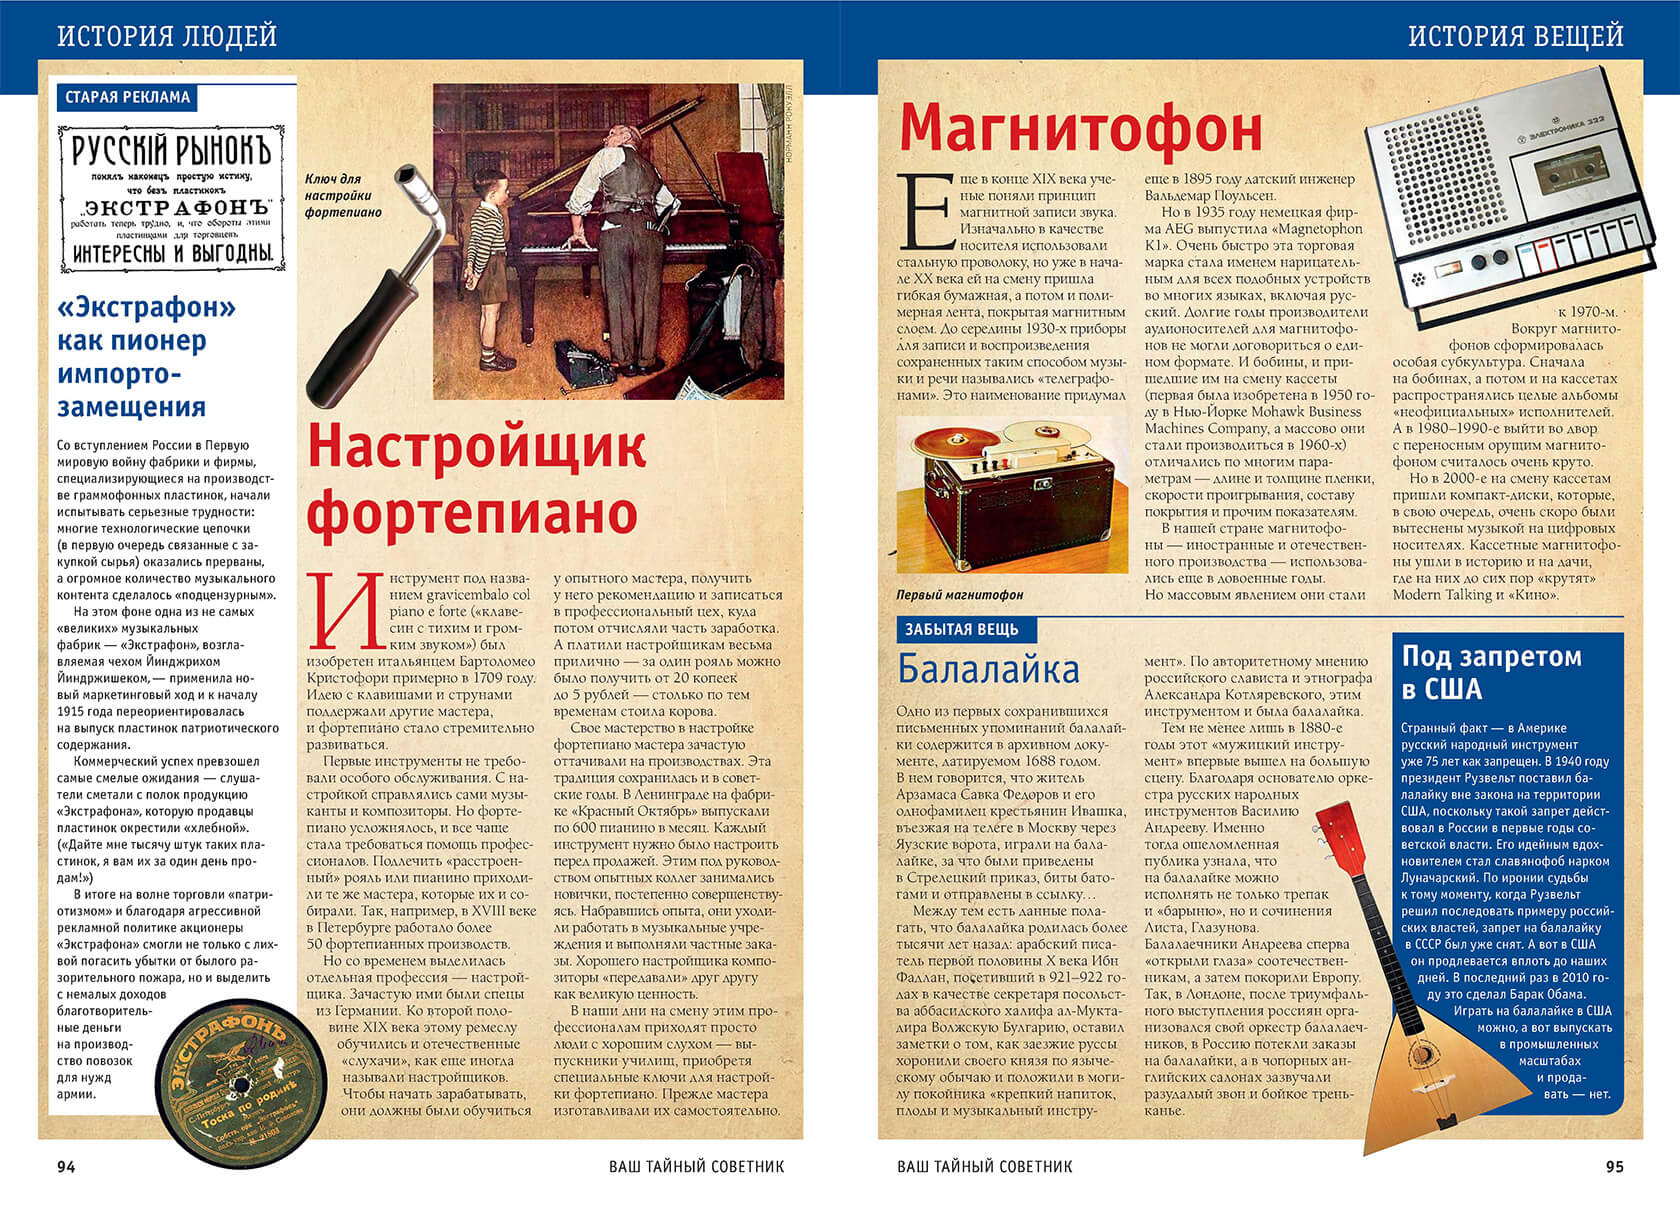 История: Настройщик пианино, магнитофон, балалайка